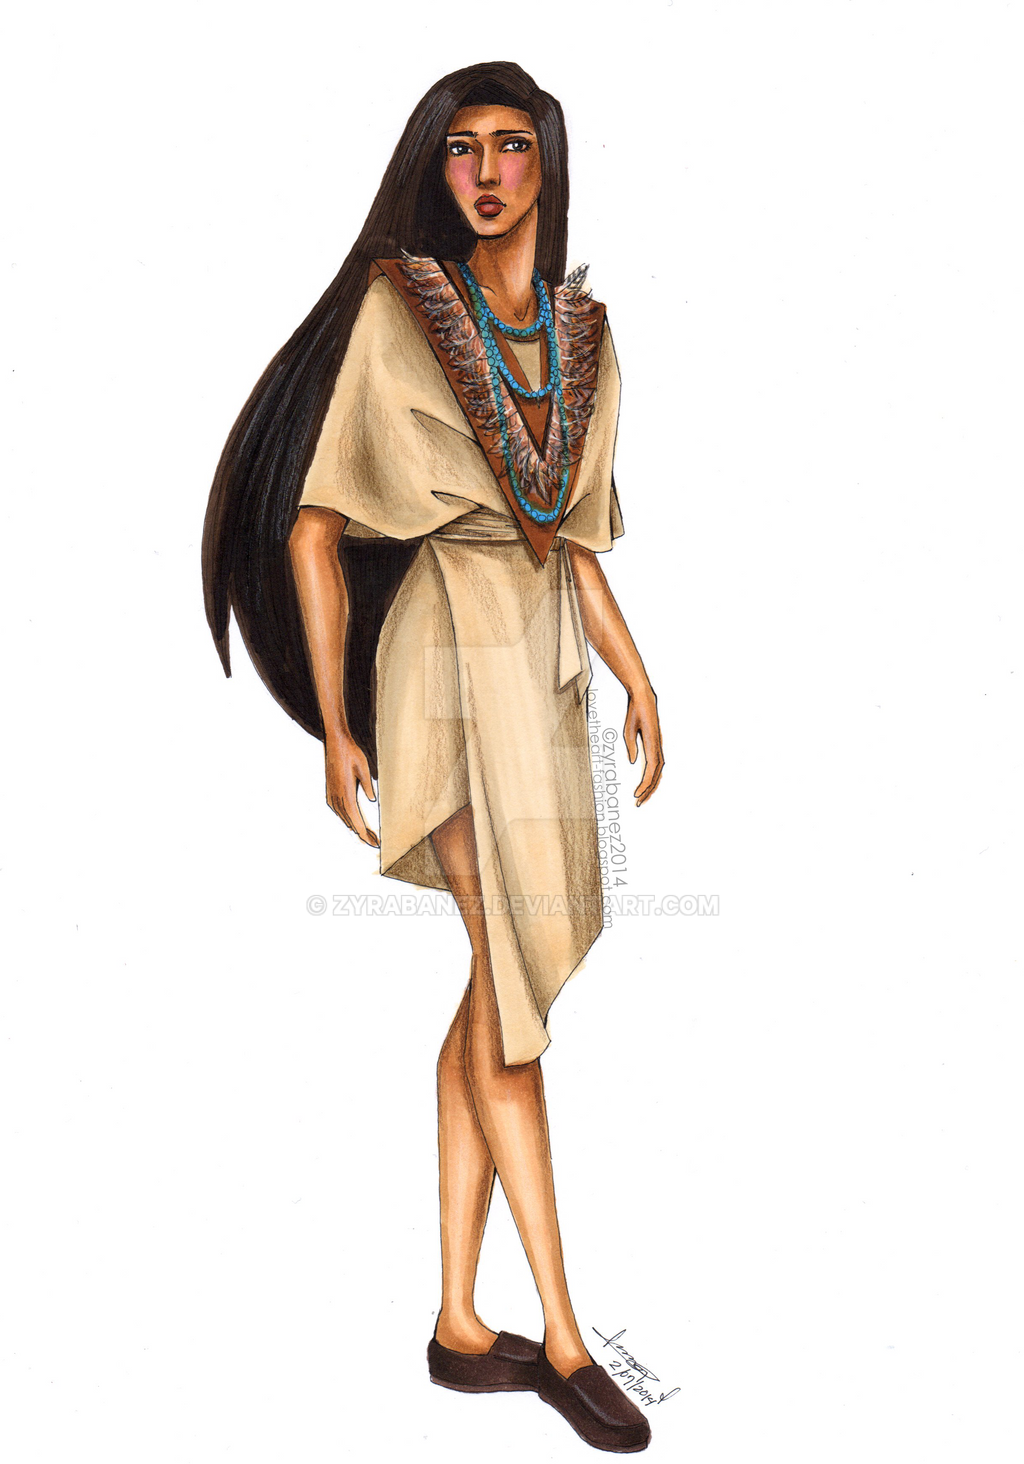 Fashion Illustration Pocahontas By Zyrabanez On DeviantArt